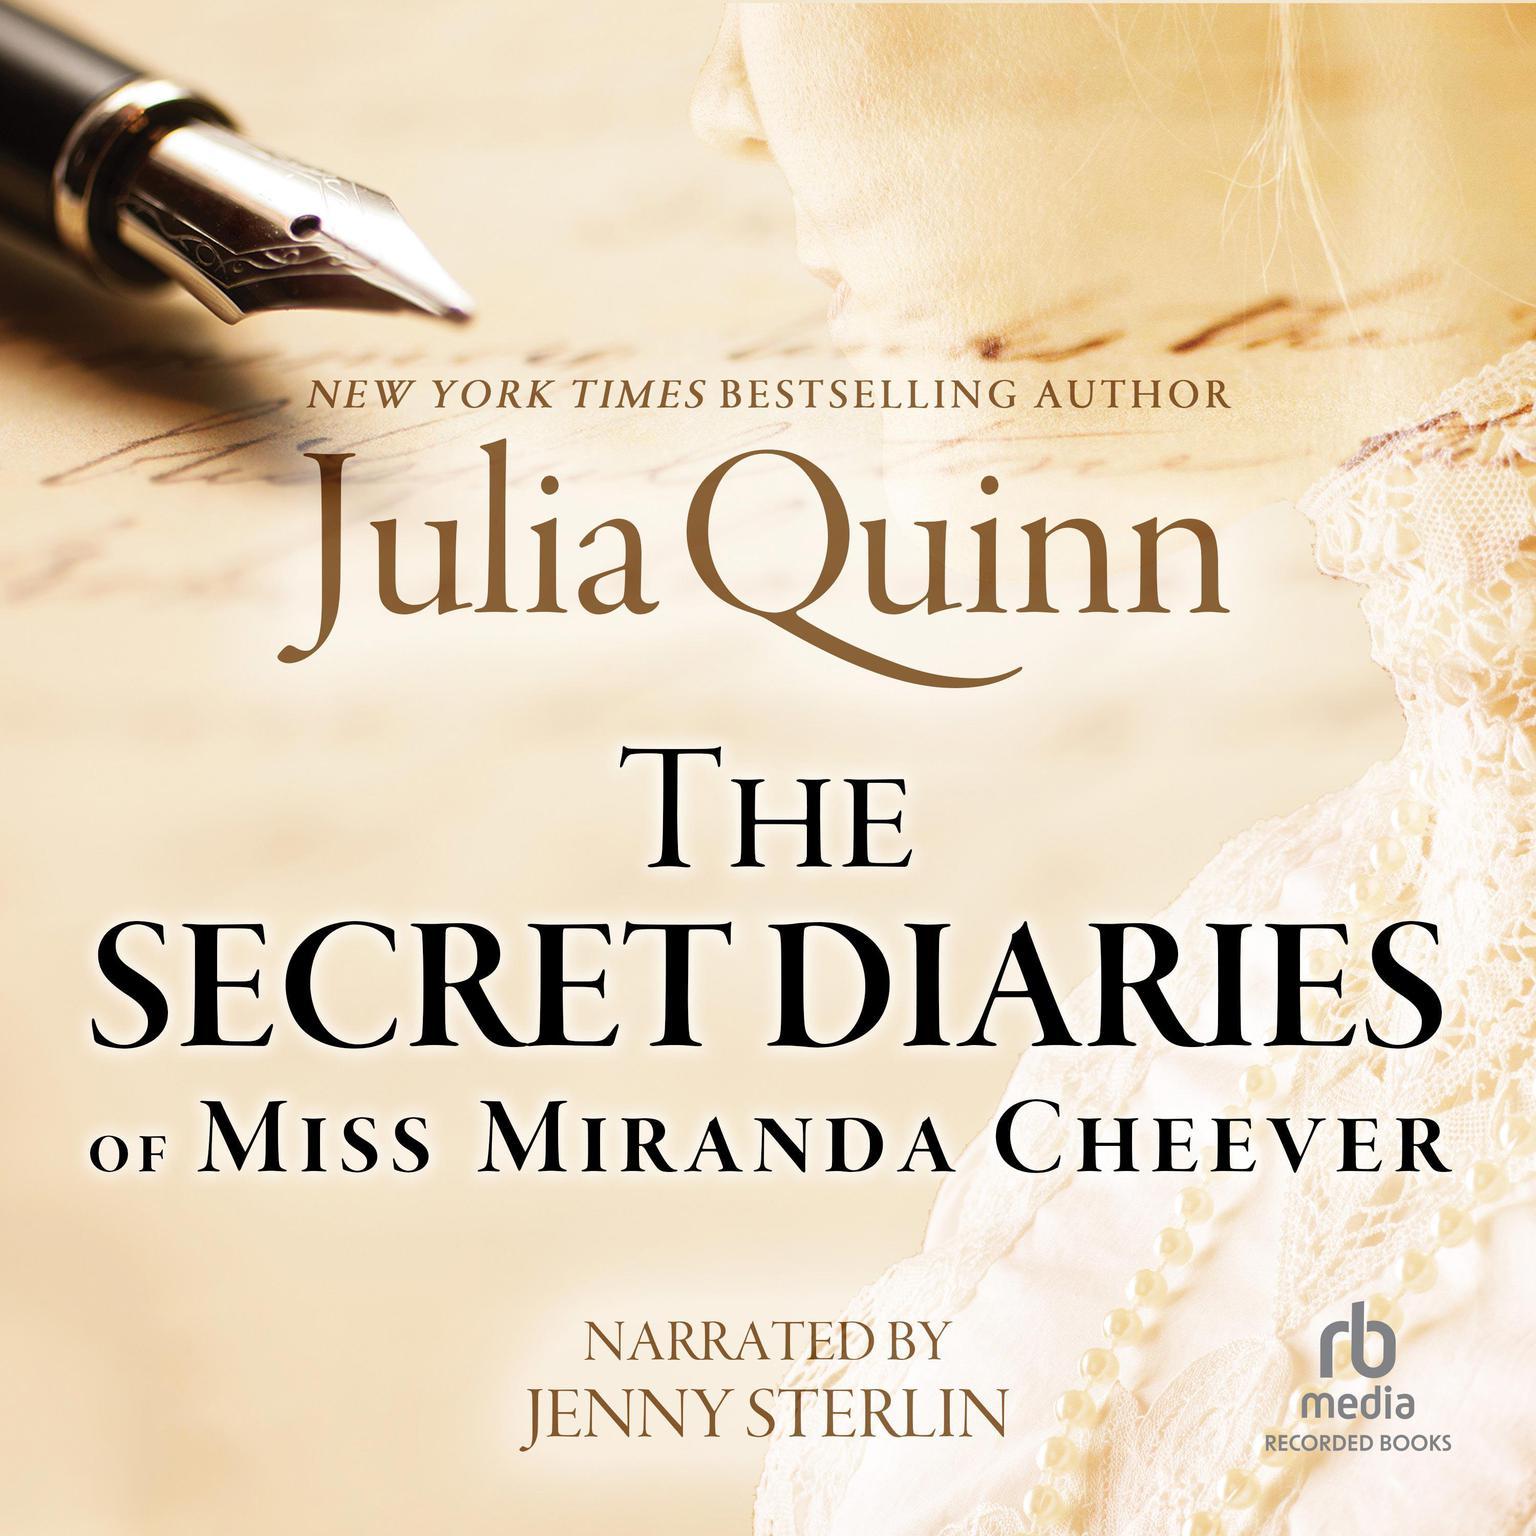 The Secret Diaries of Miss Miranda Cheever Audiobook, by Julia Quinn